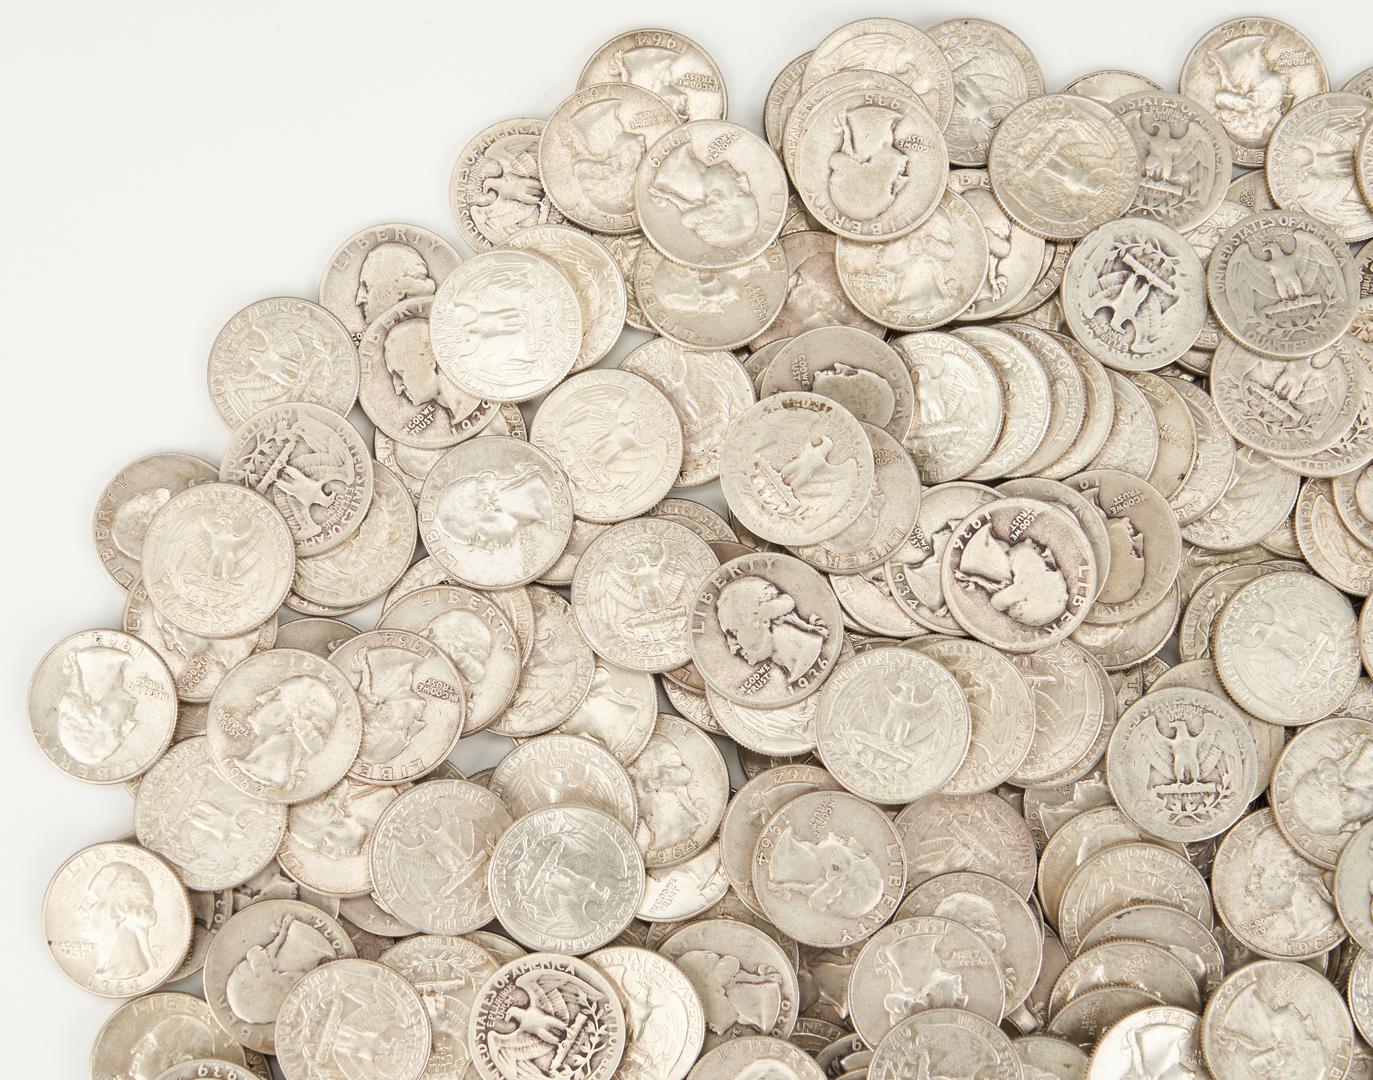 Lot 734: 412 90% silver Washington Quarters, 1930-39, 64-D